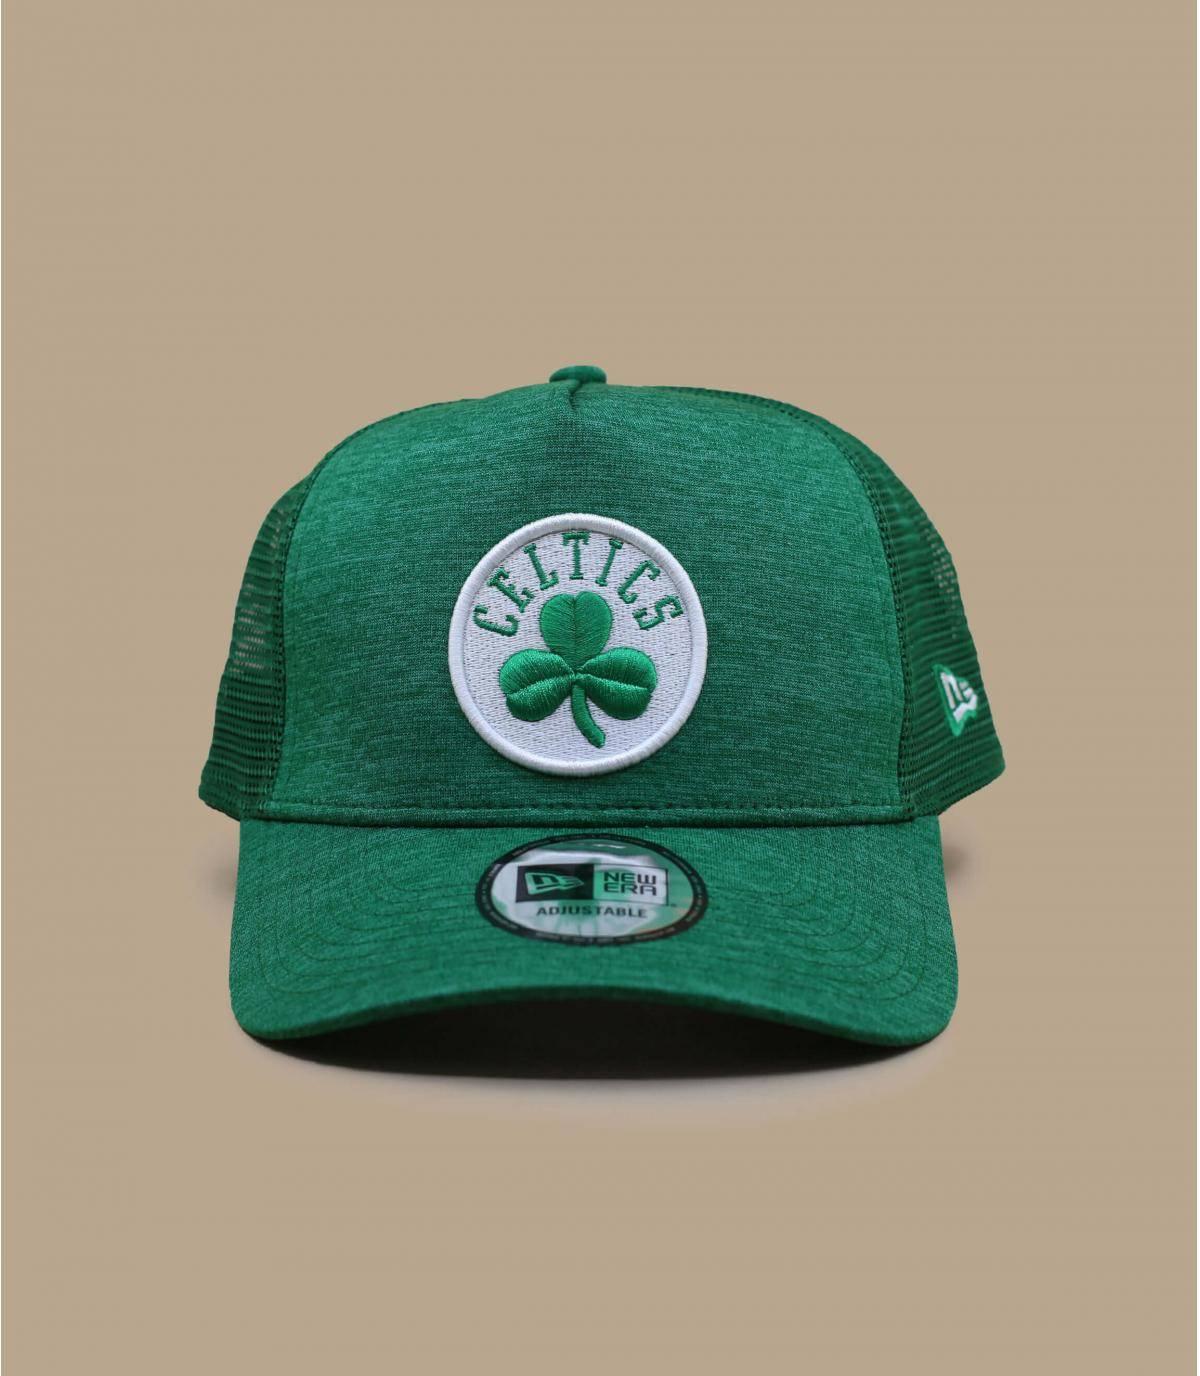 Details Trucker Shadown Tech Celtics - afbeeling 2